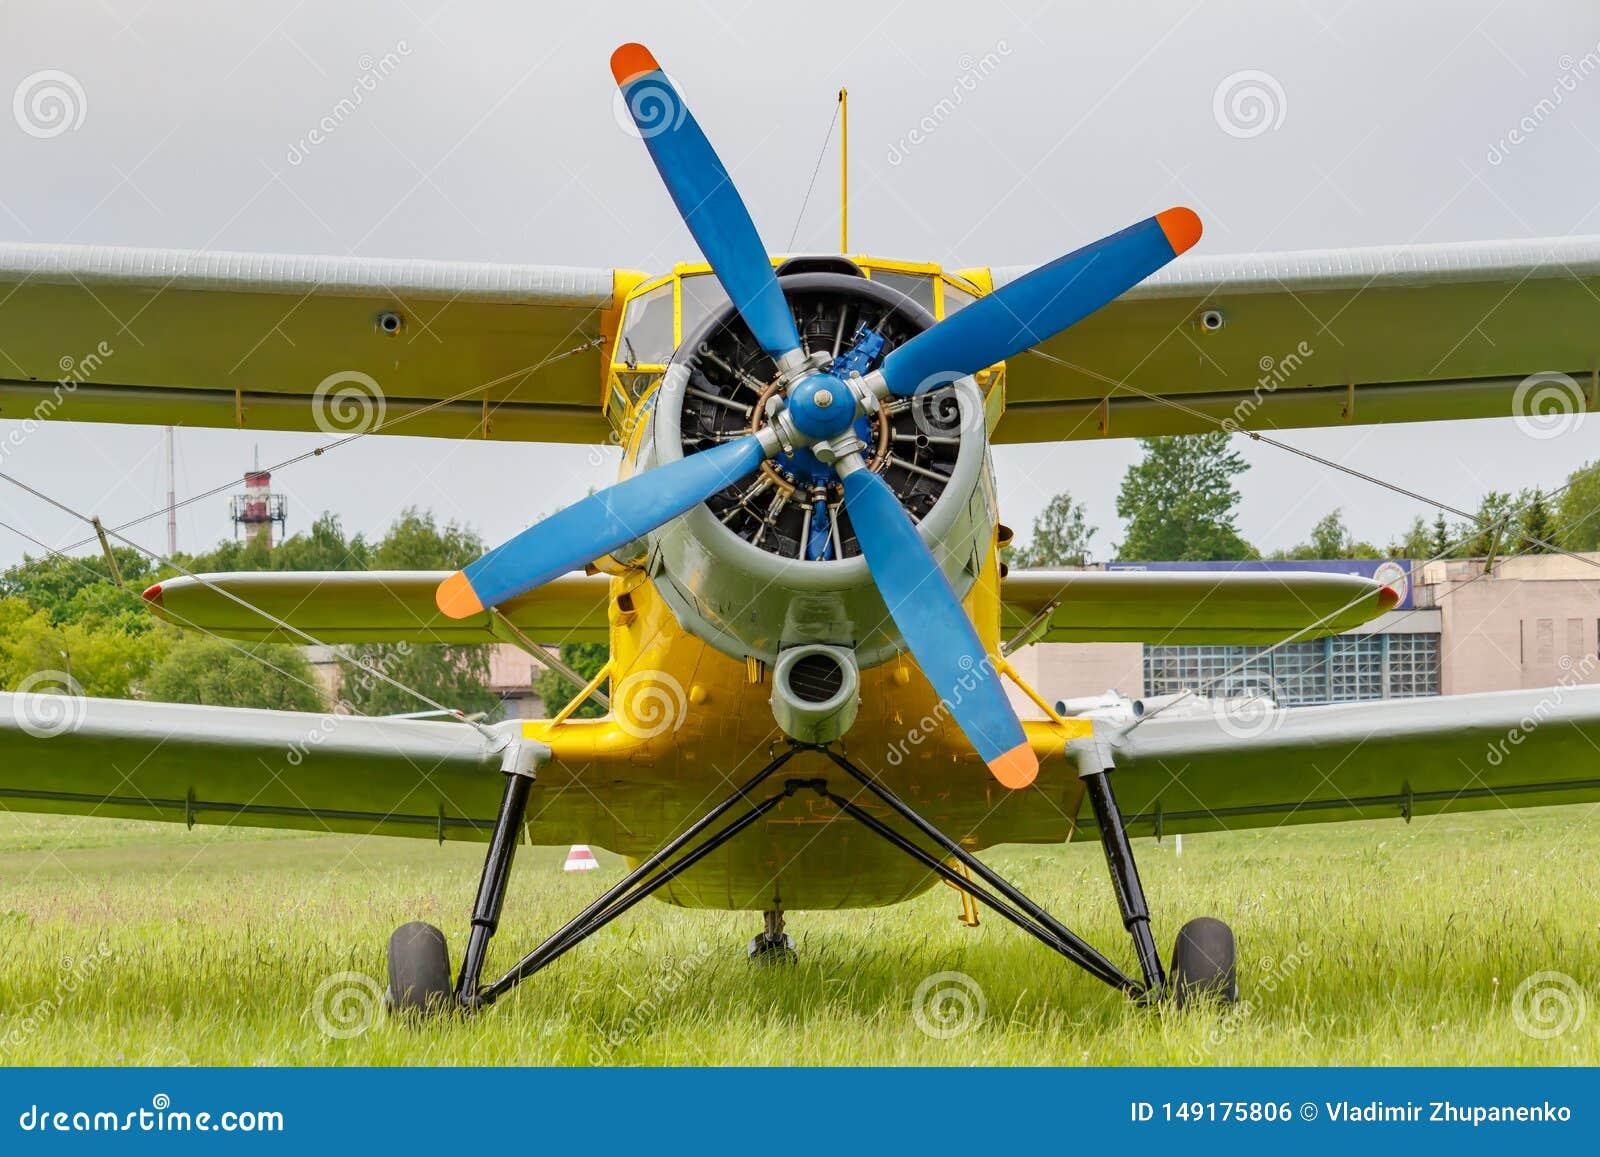 Sovjetvliegtuigentweedekker Antonov een-2 met blauwe vier bladpropeller en gele die fuselage op een groen gras van vliegveld word